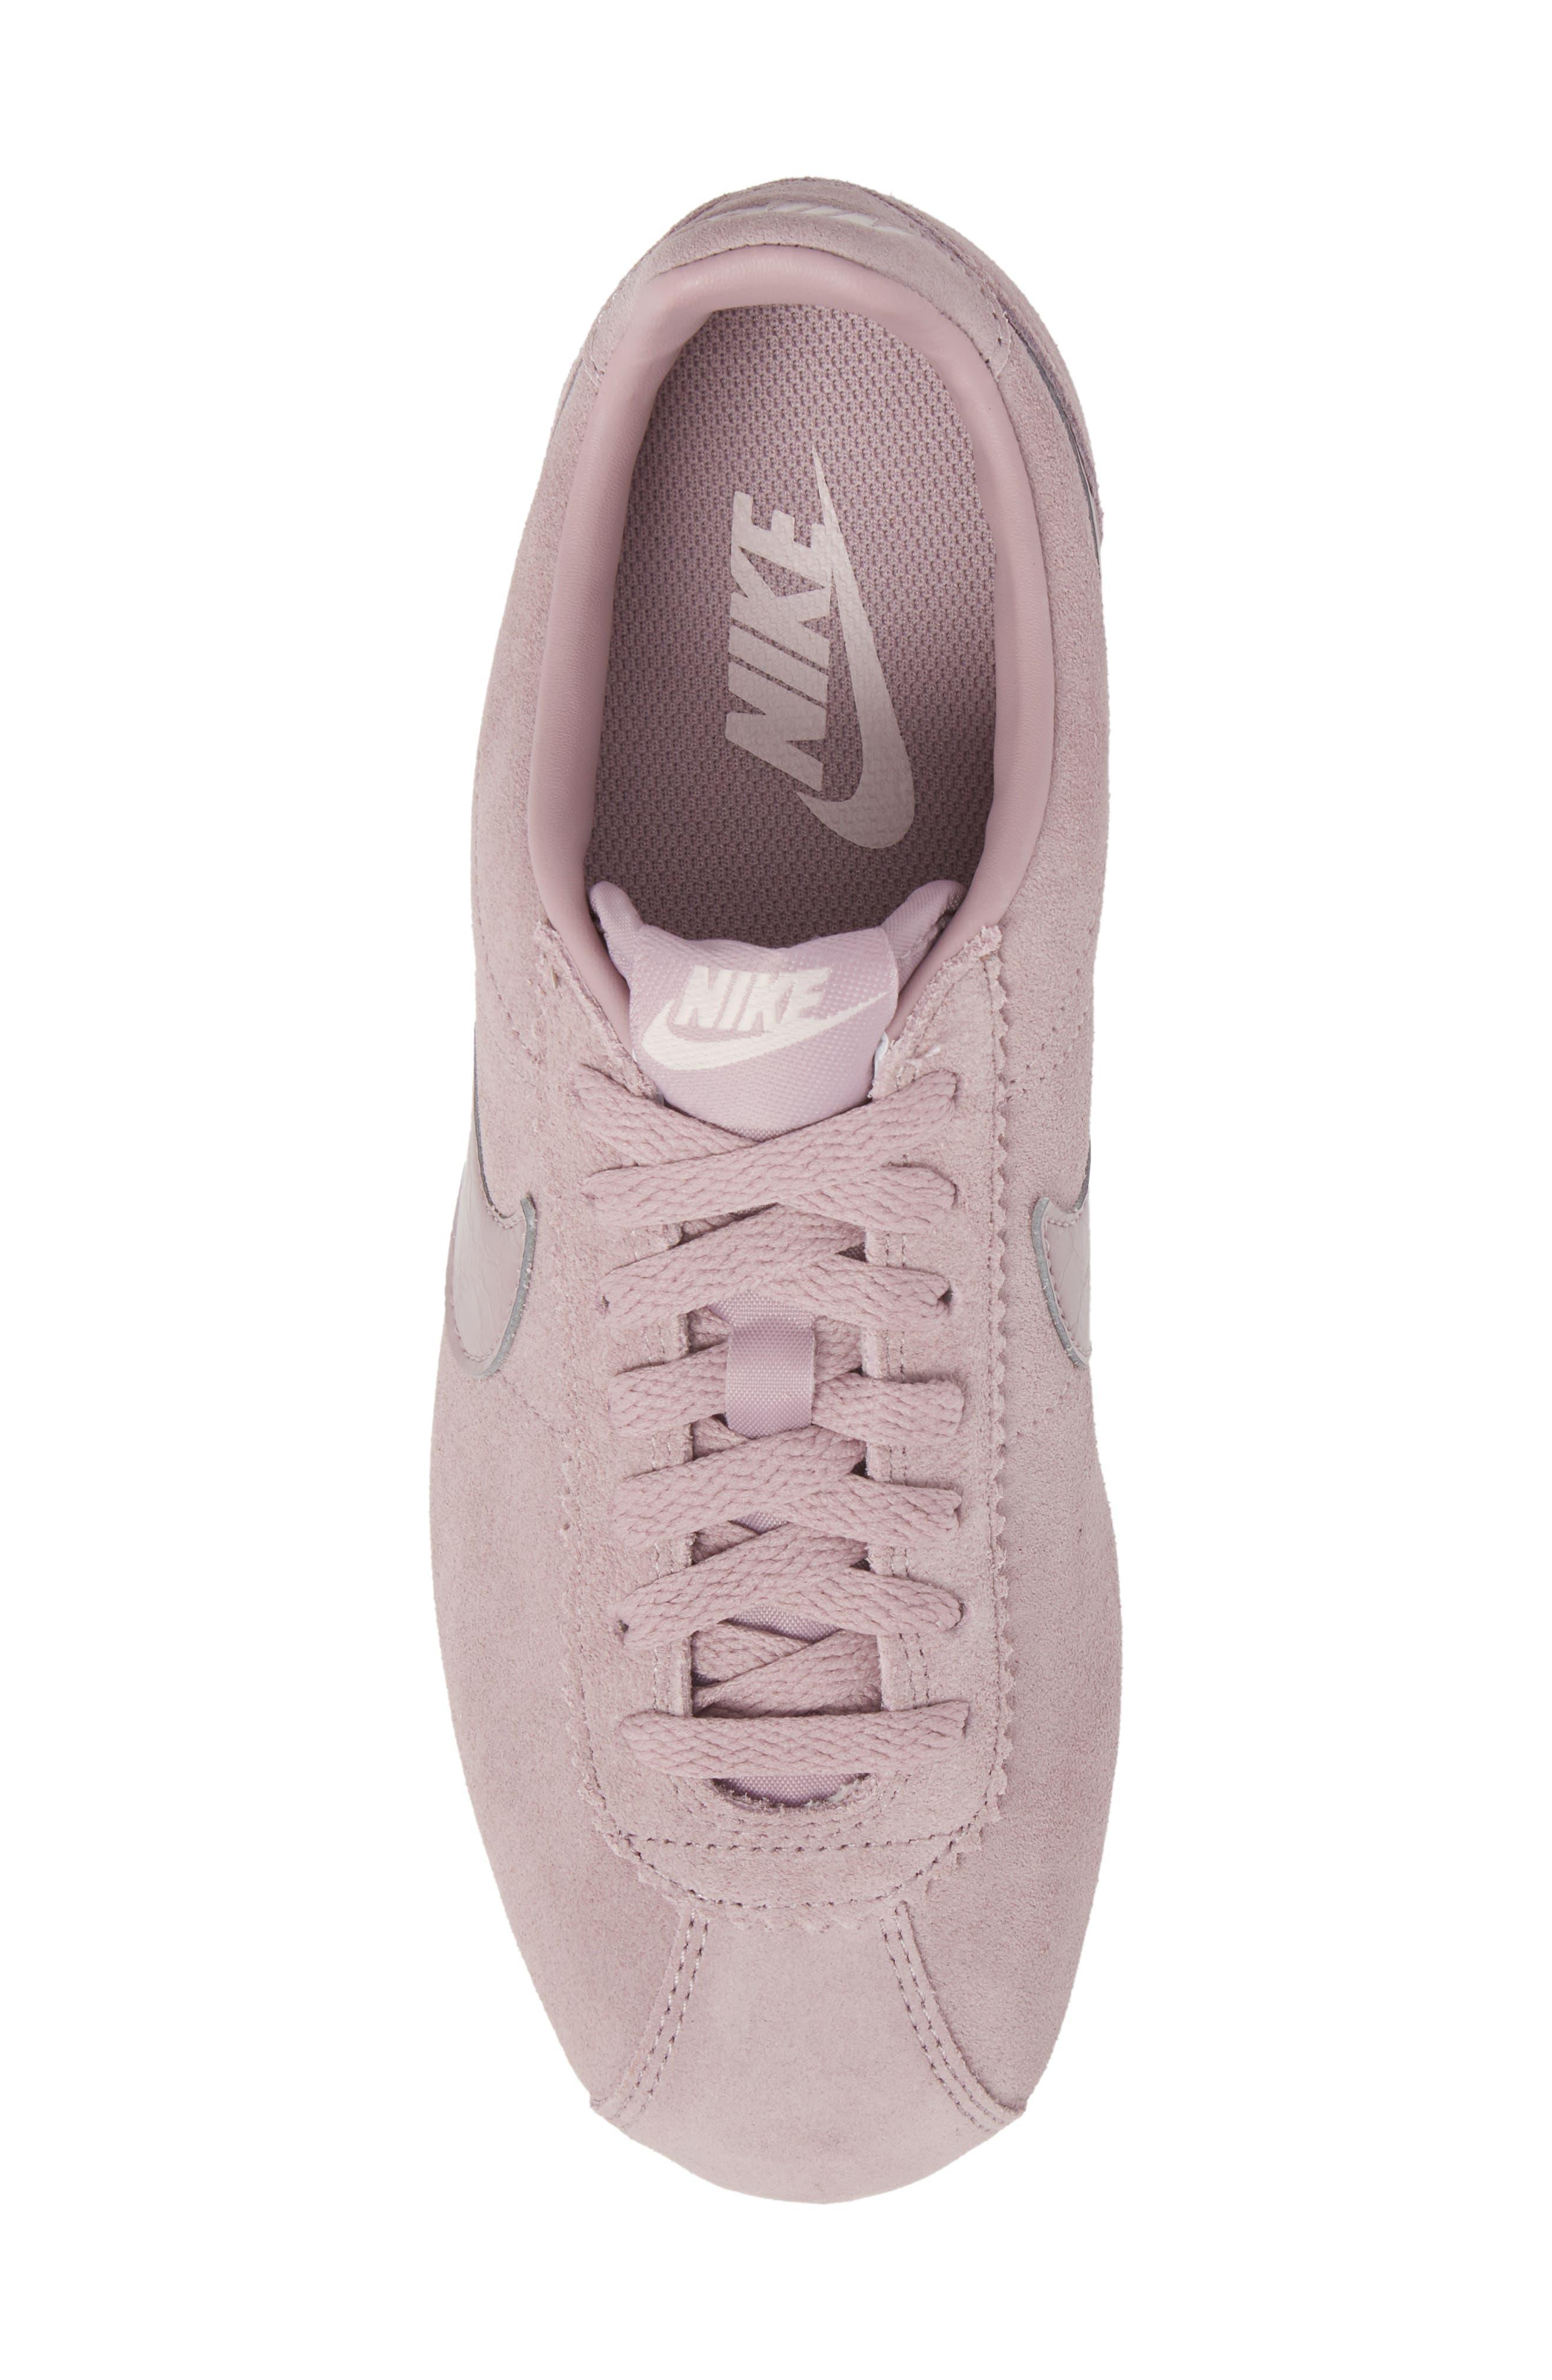 NIKE,                             Classic Cortez Suede Sneaker,                             Alternate thumbnail 5, color,                             650